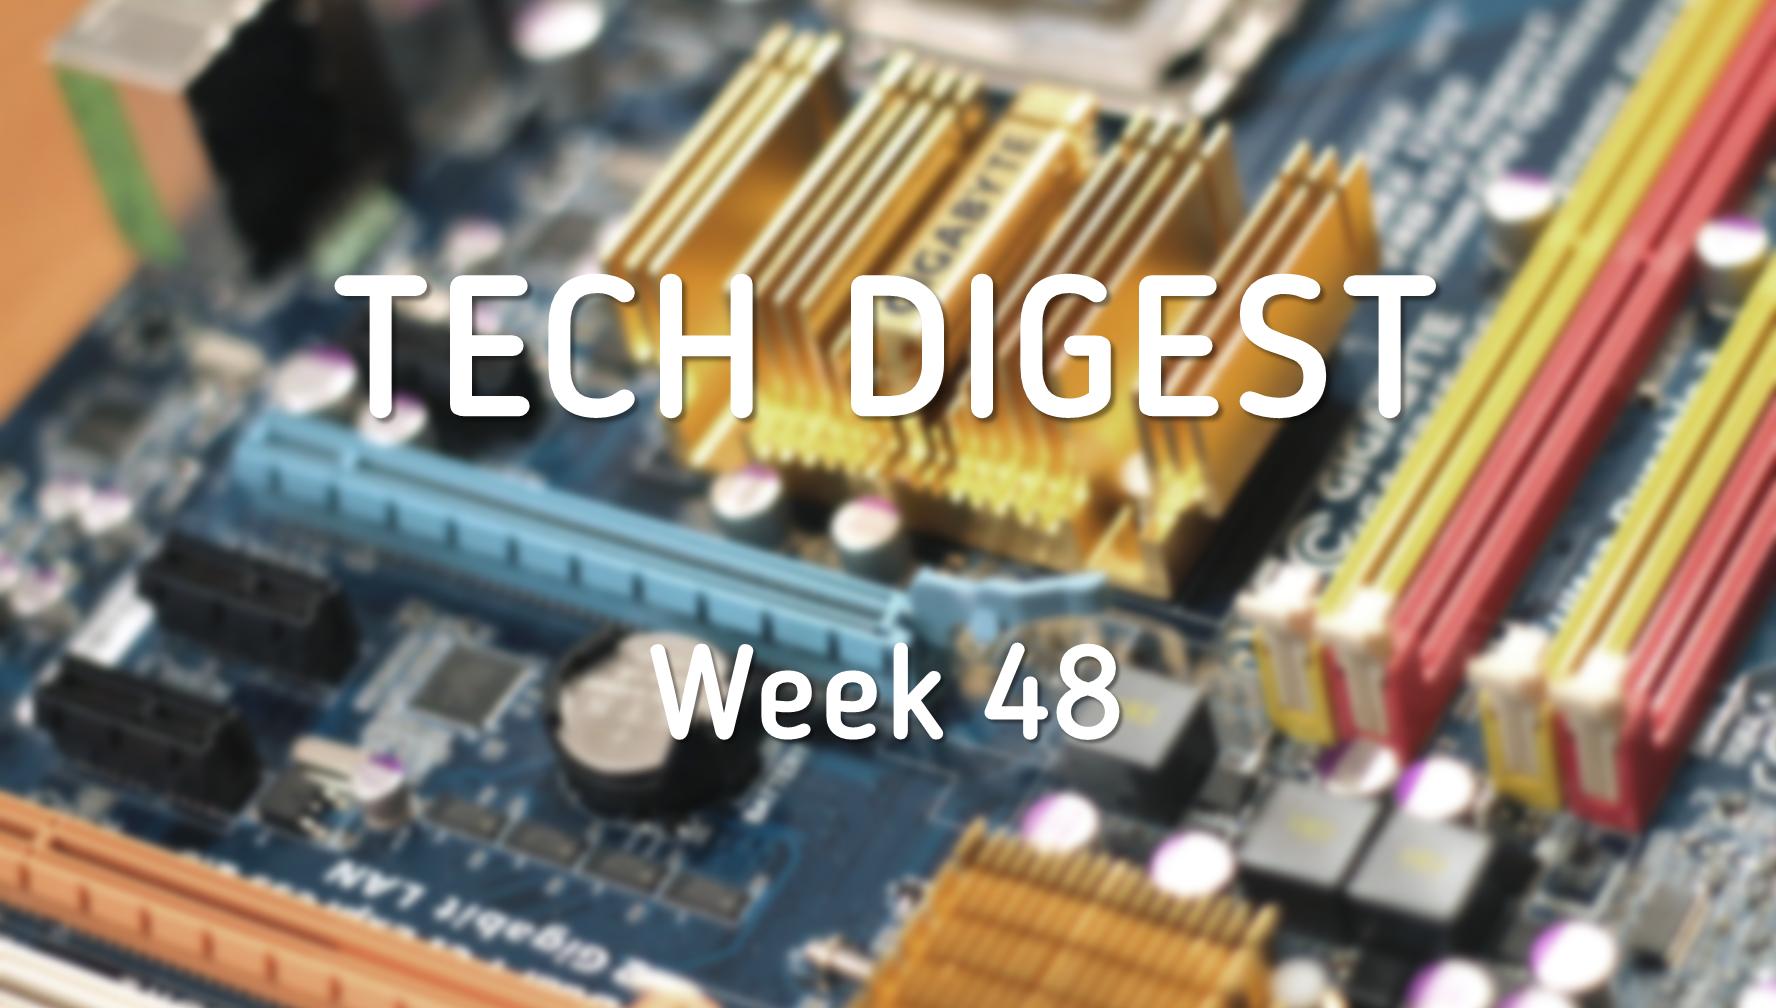 Tech digest, week 48.png